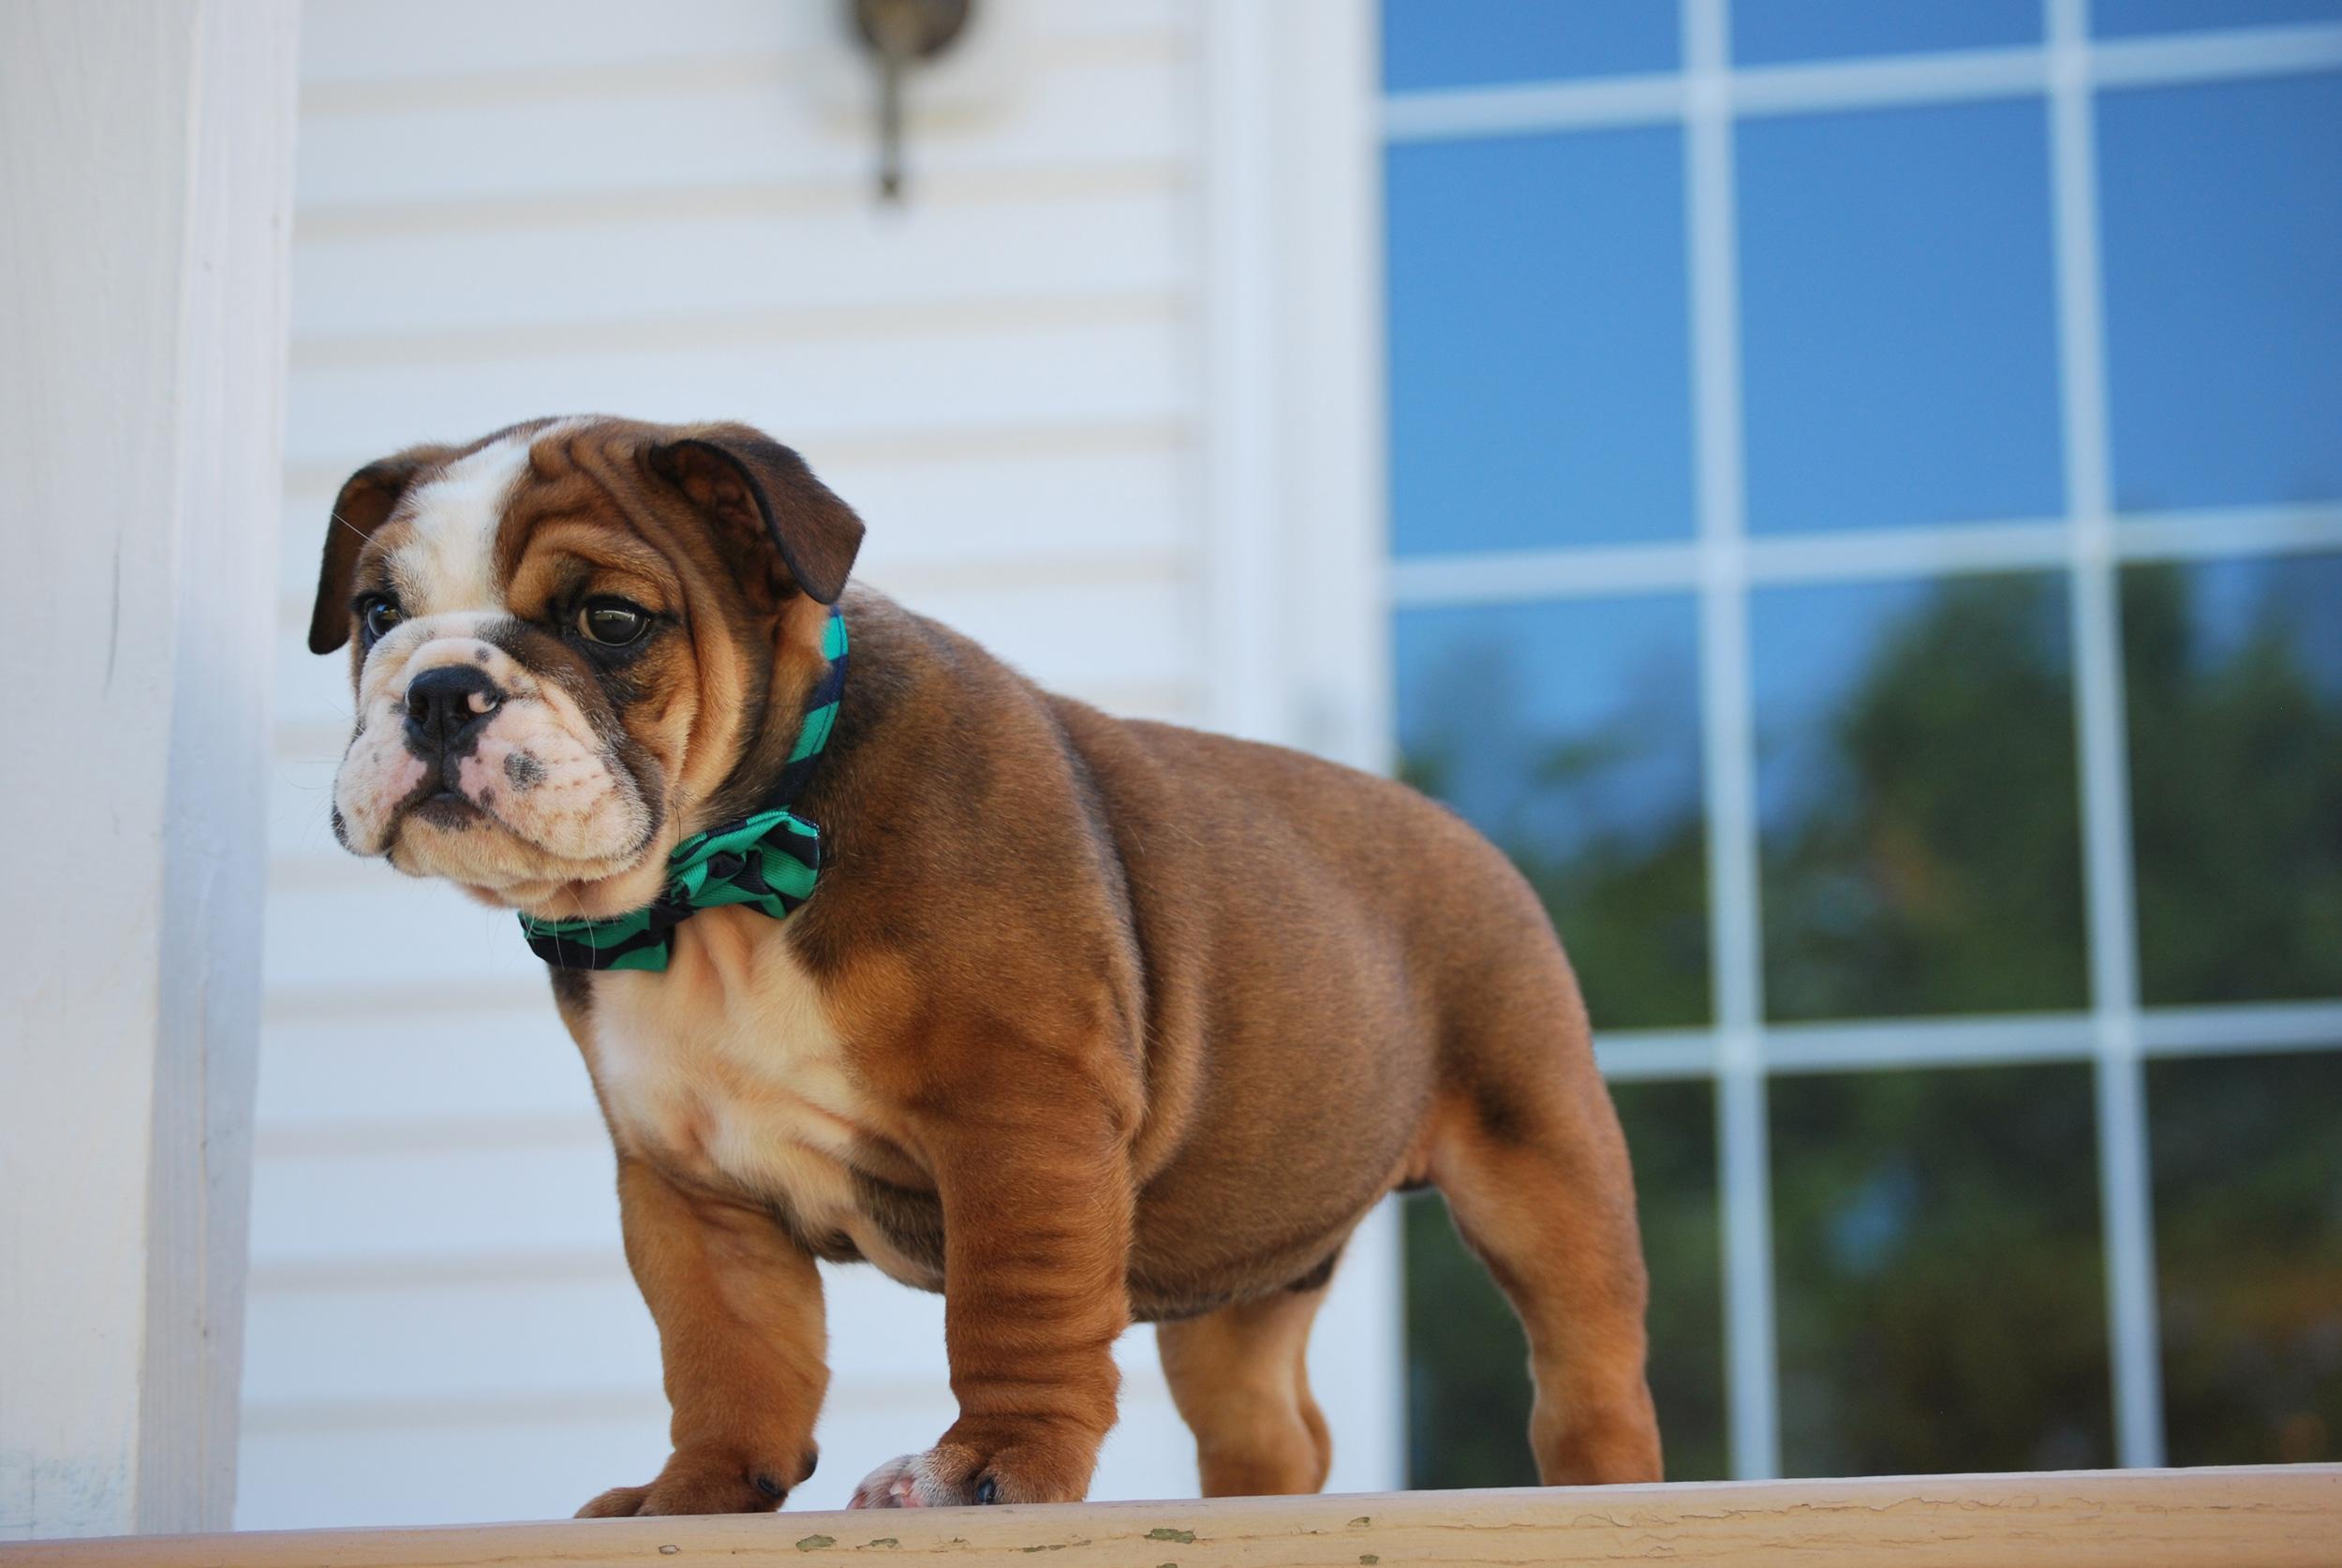 bulldog puppy with bowtie